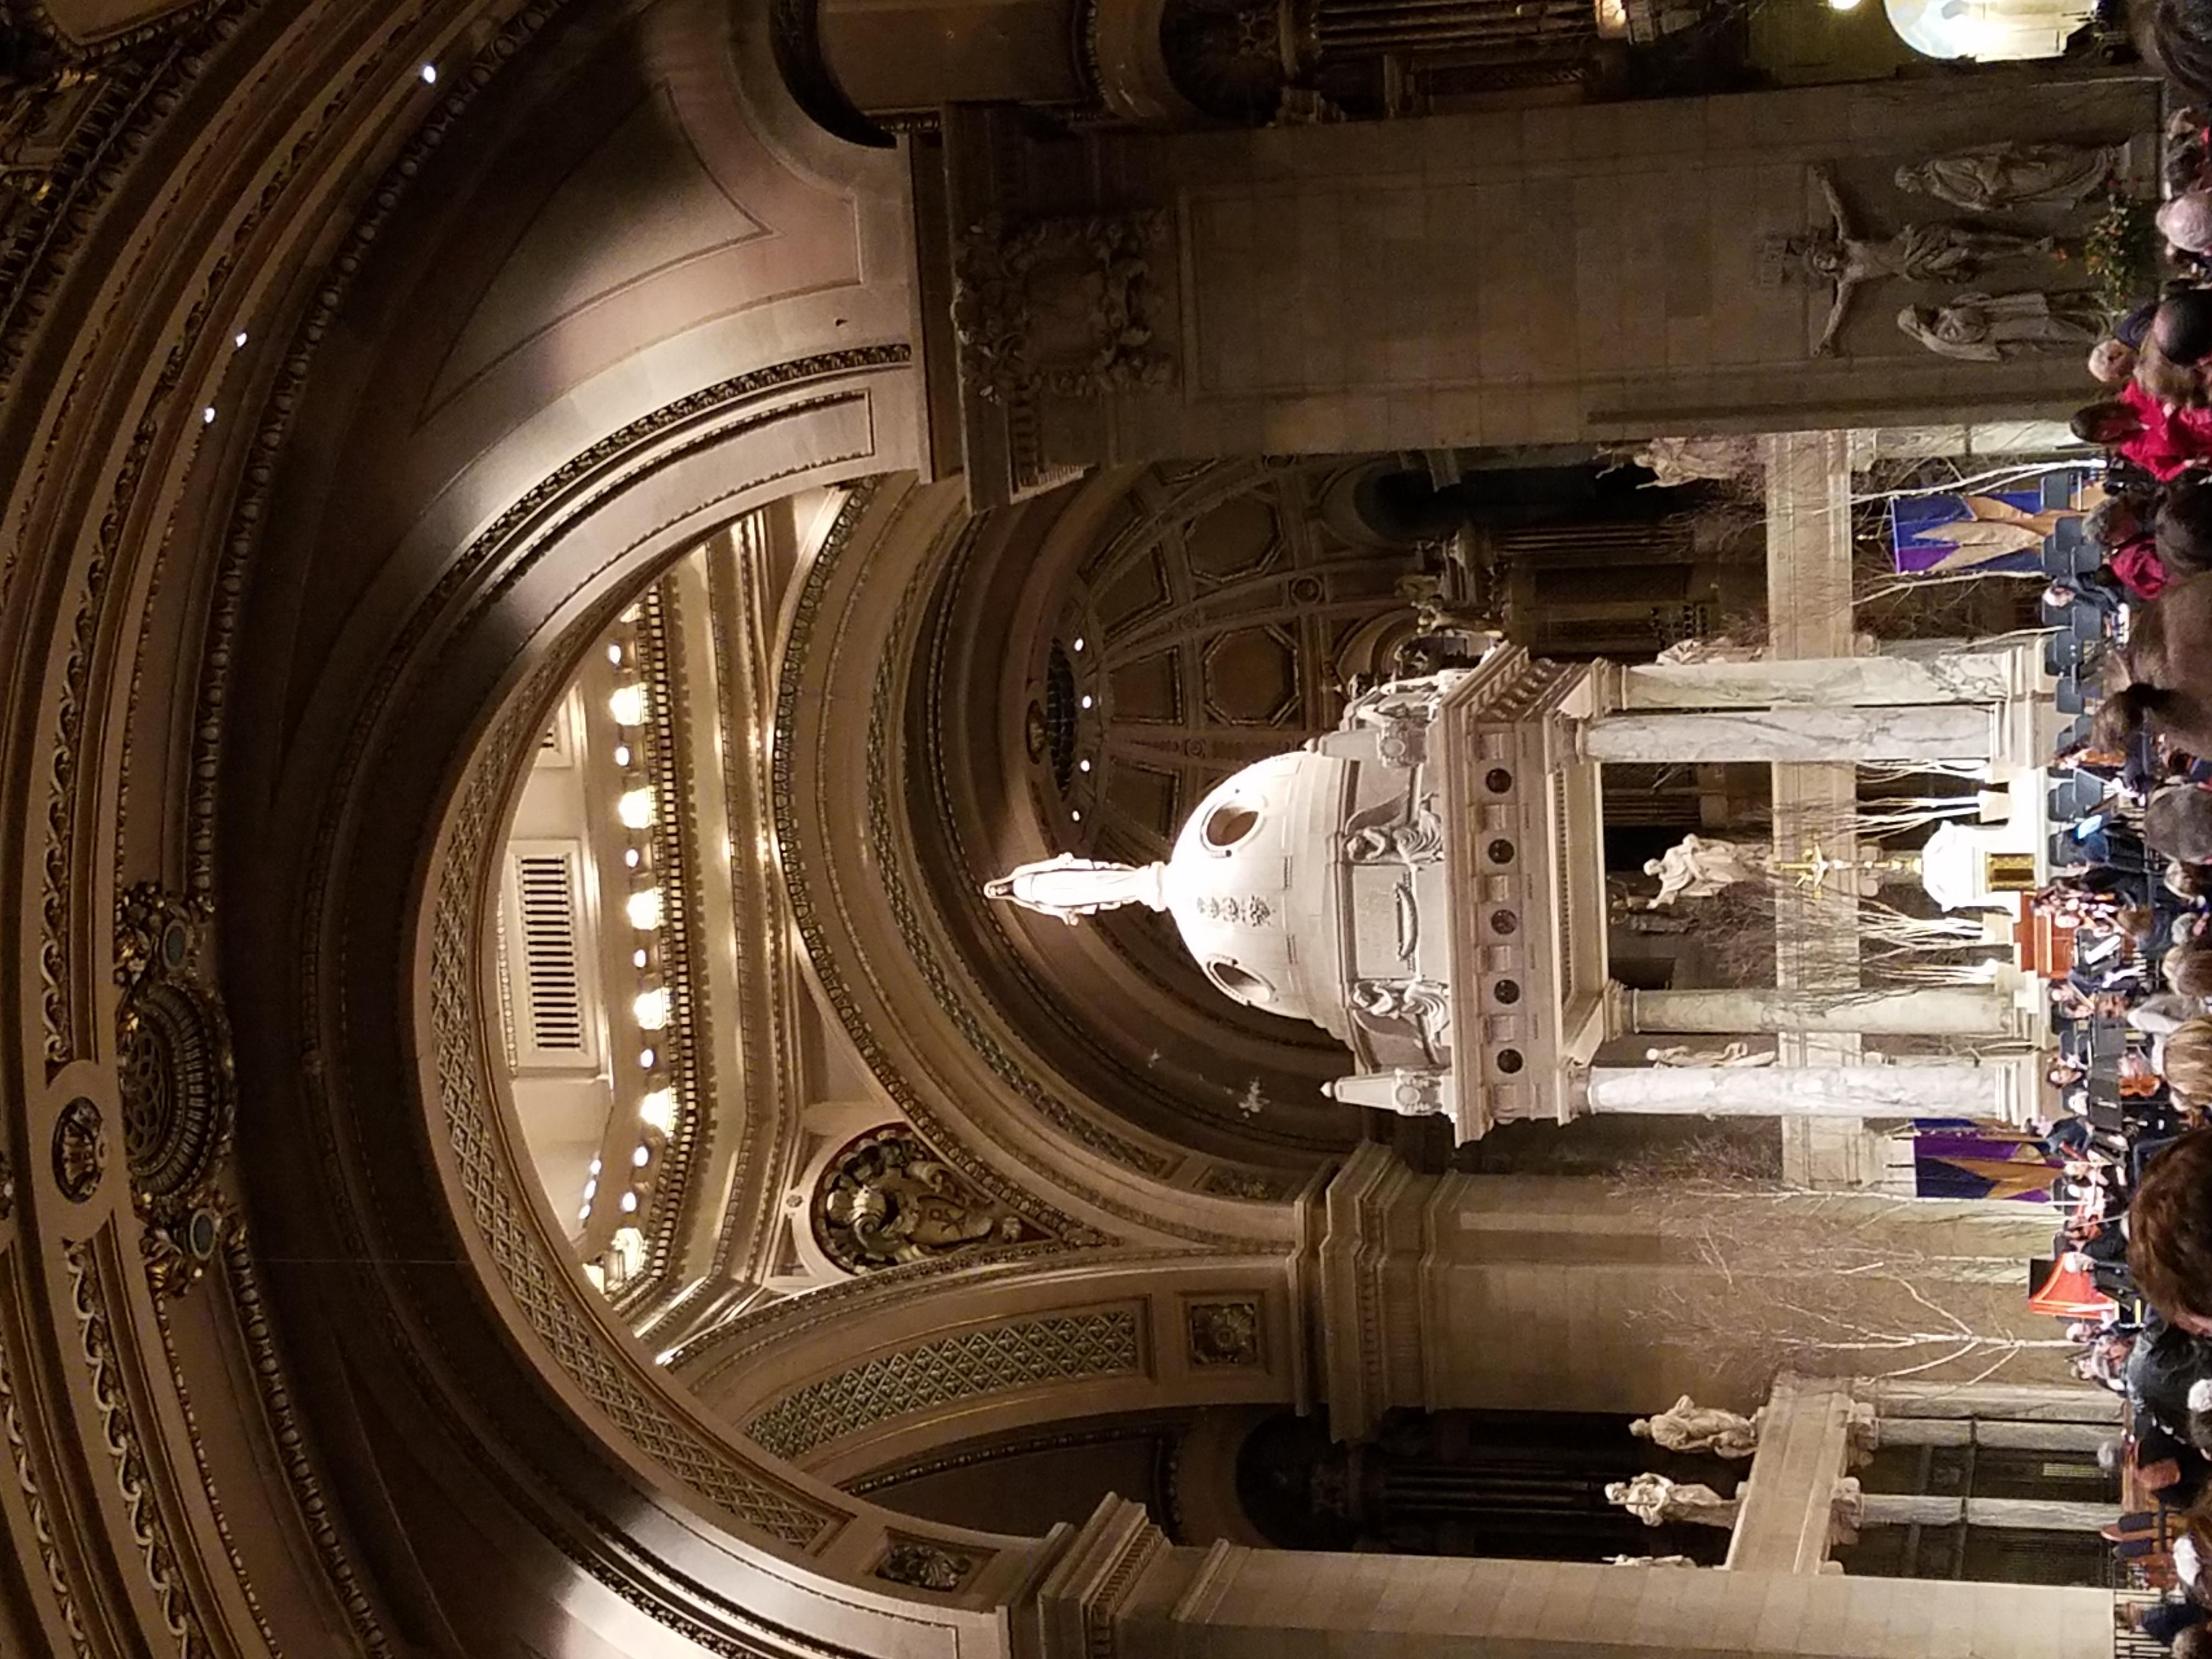 basilica-of-st-mary-interior-295.jpg